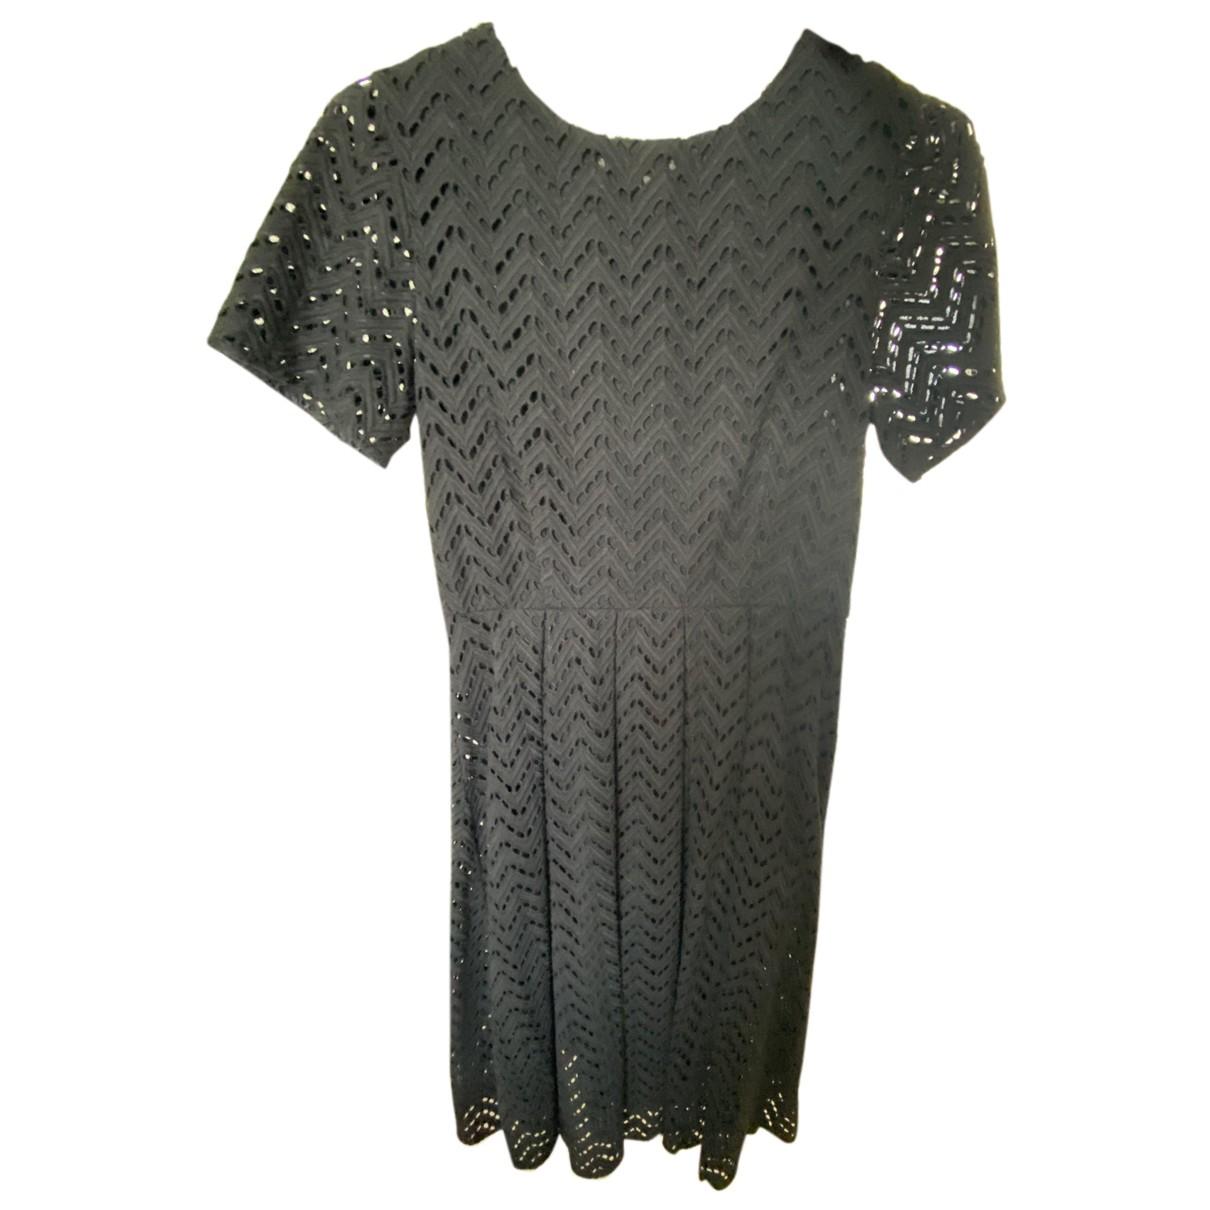 Ymc \N Kleid in  Schwarz Baumwolle